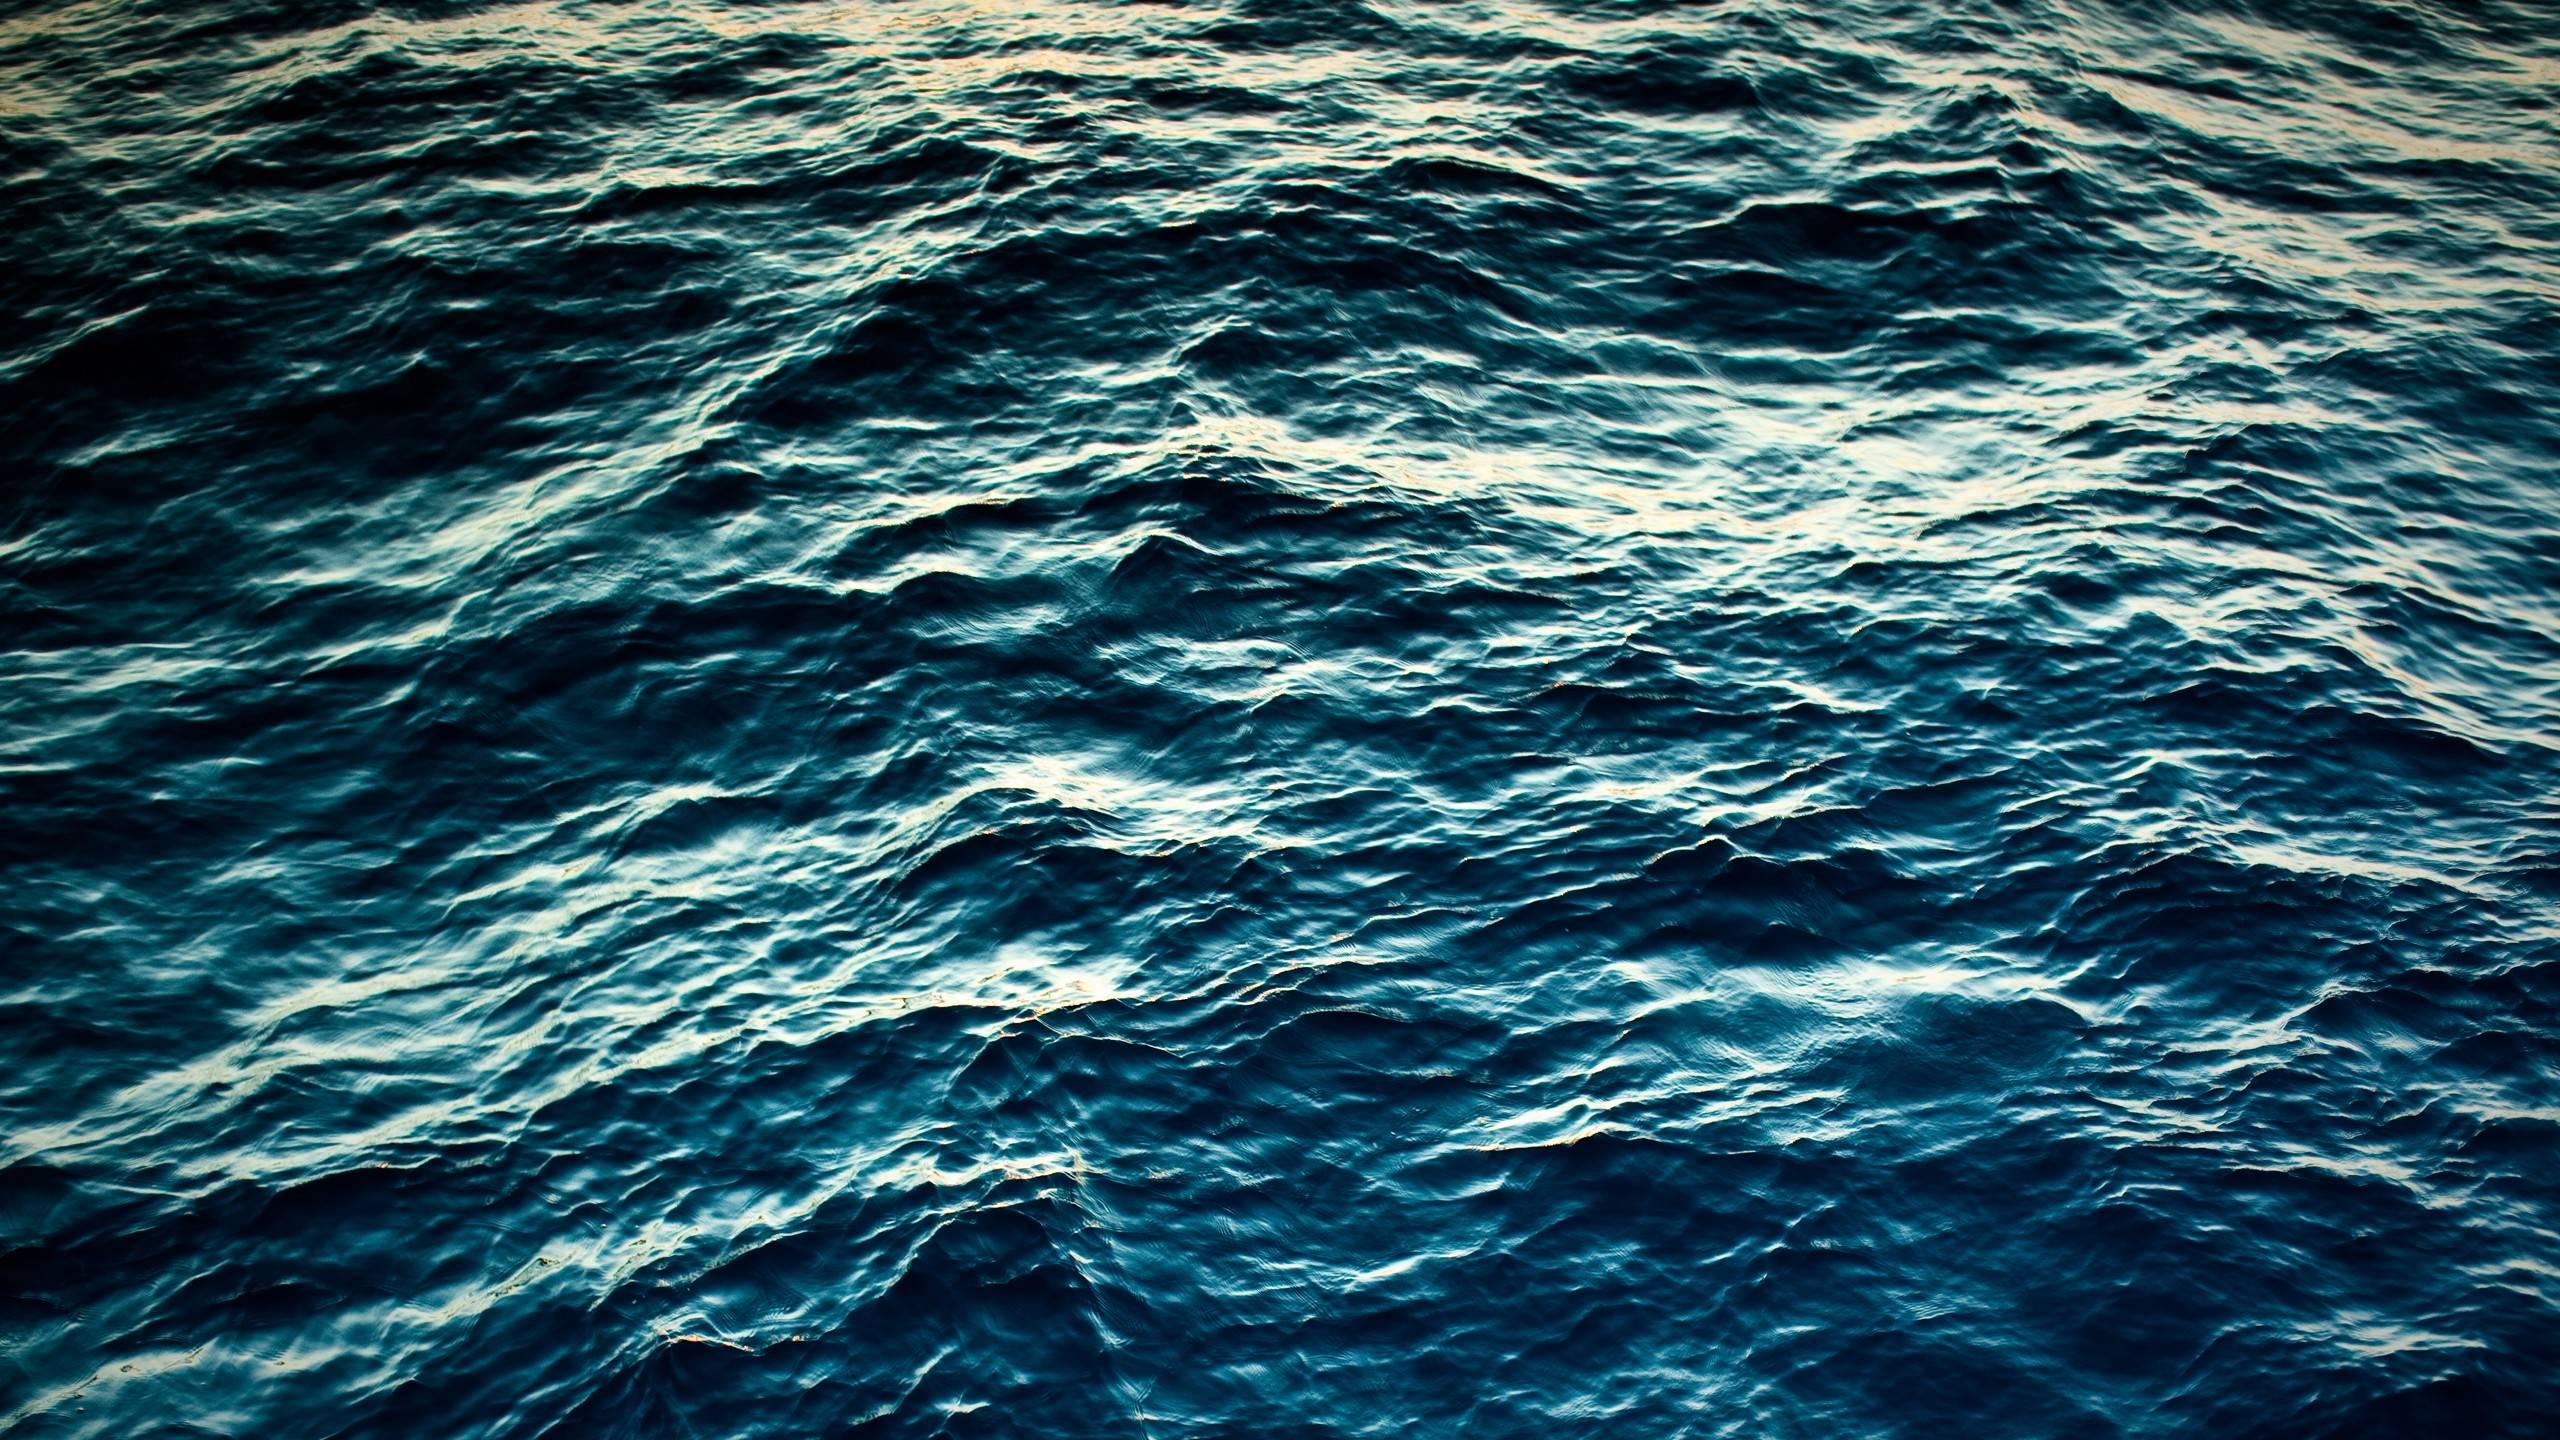 Ocean Texture Wallpapers Top Free Ocean Texture Backgrounds Wallpaperaccess